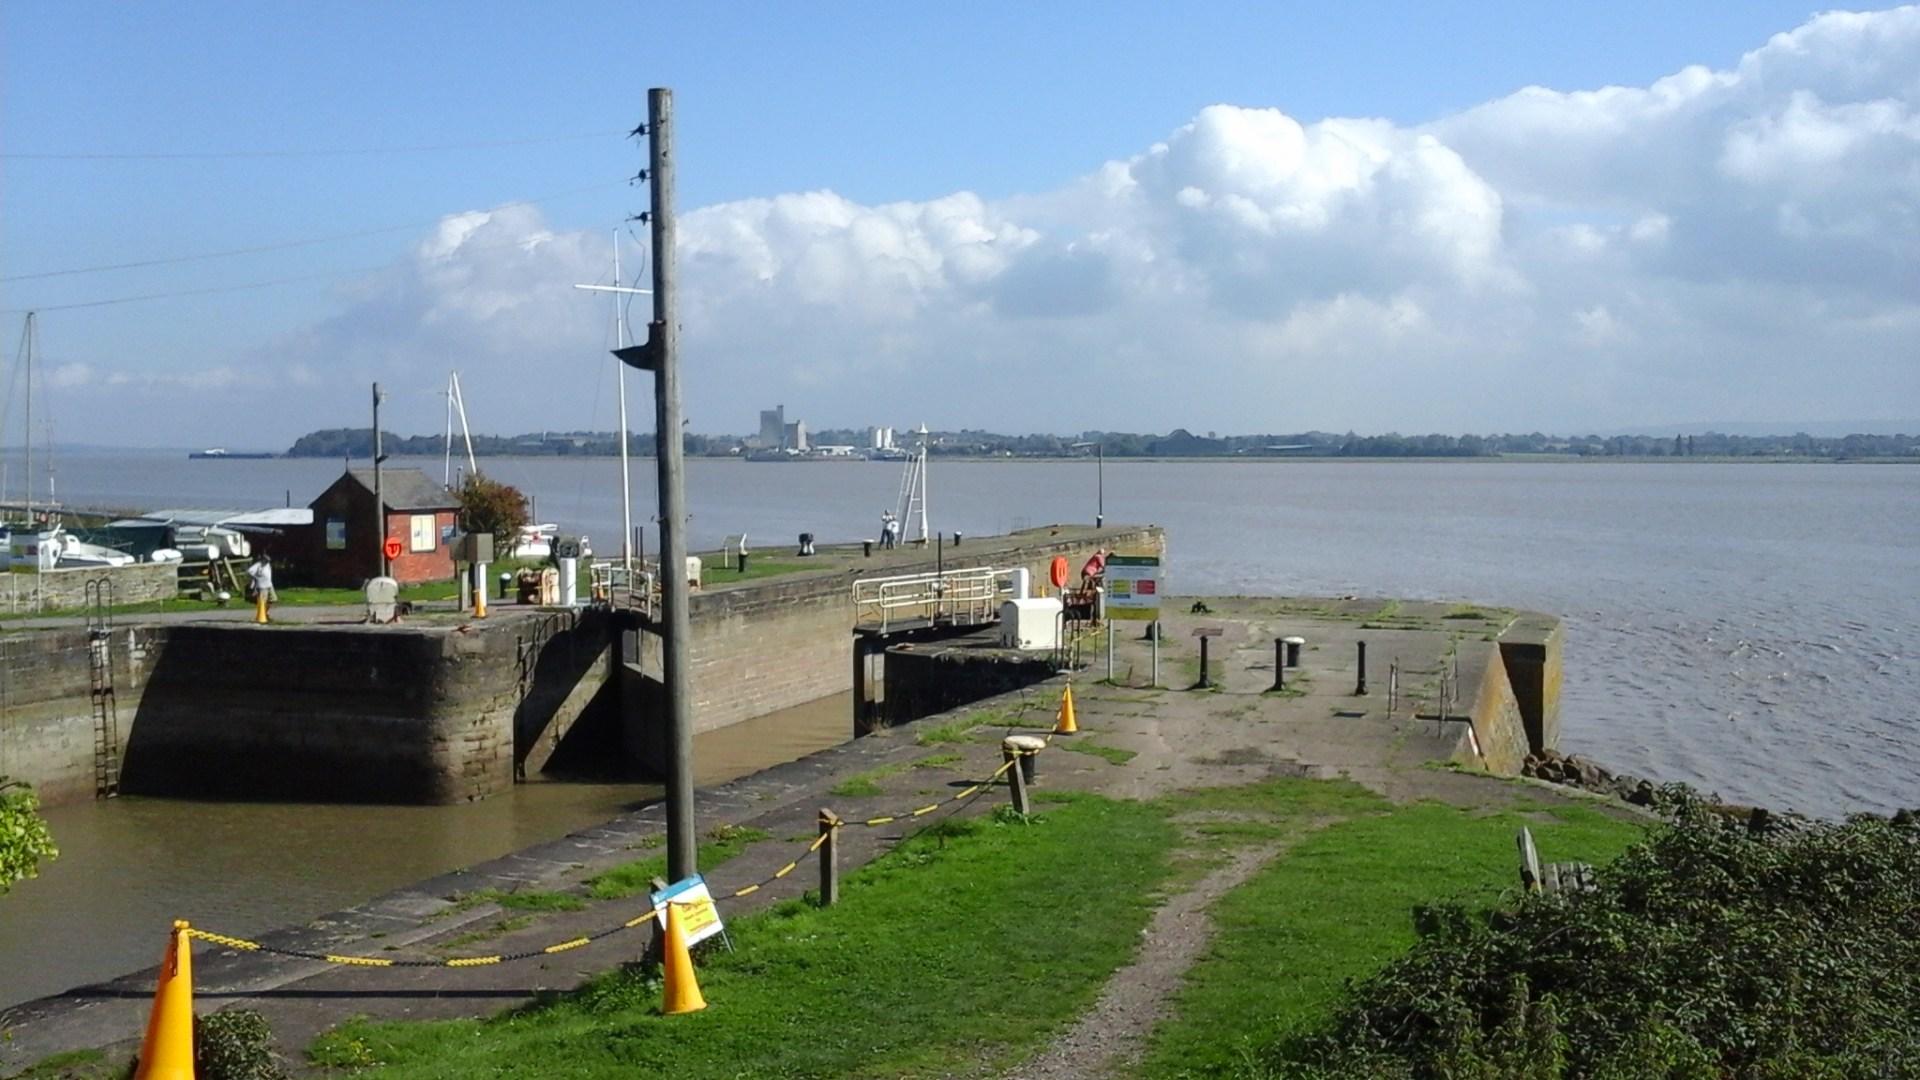 Lydney Harbour & Docks Walking